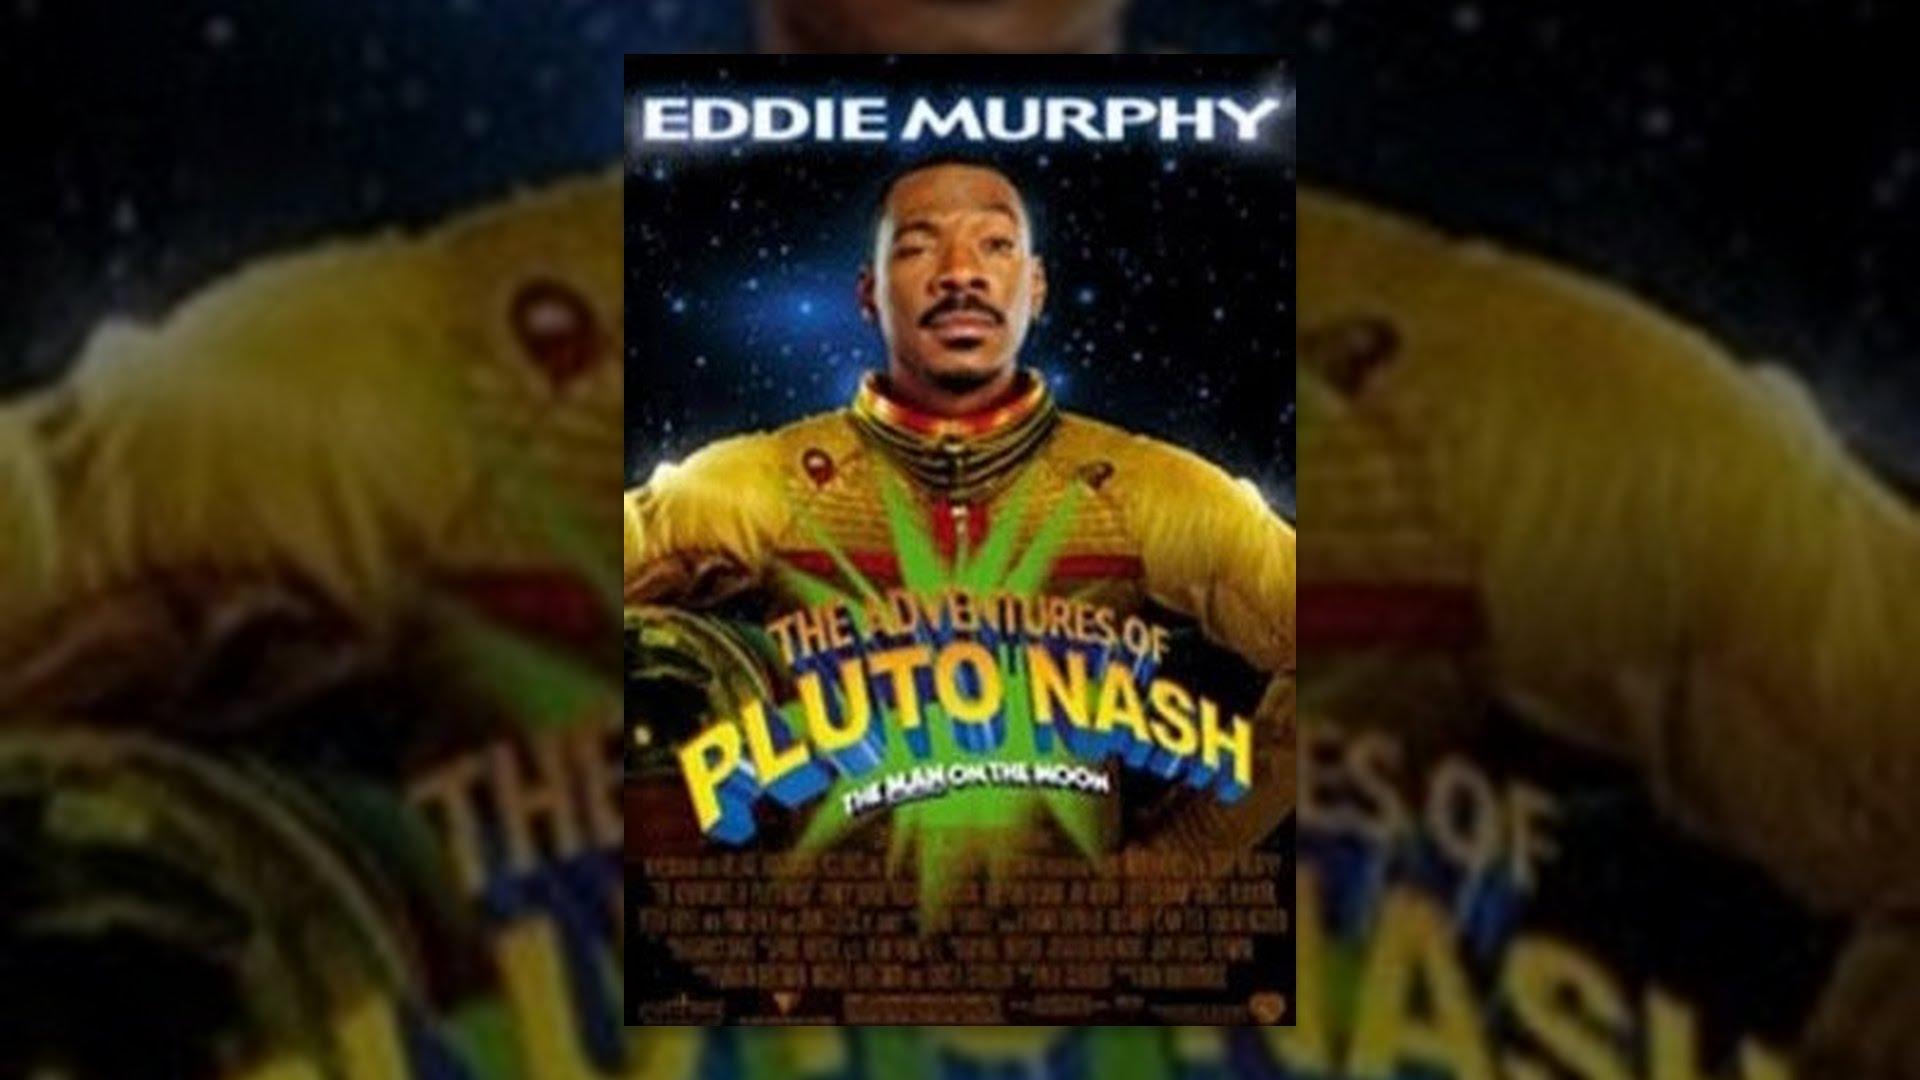 Pluto Nash